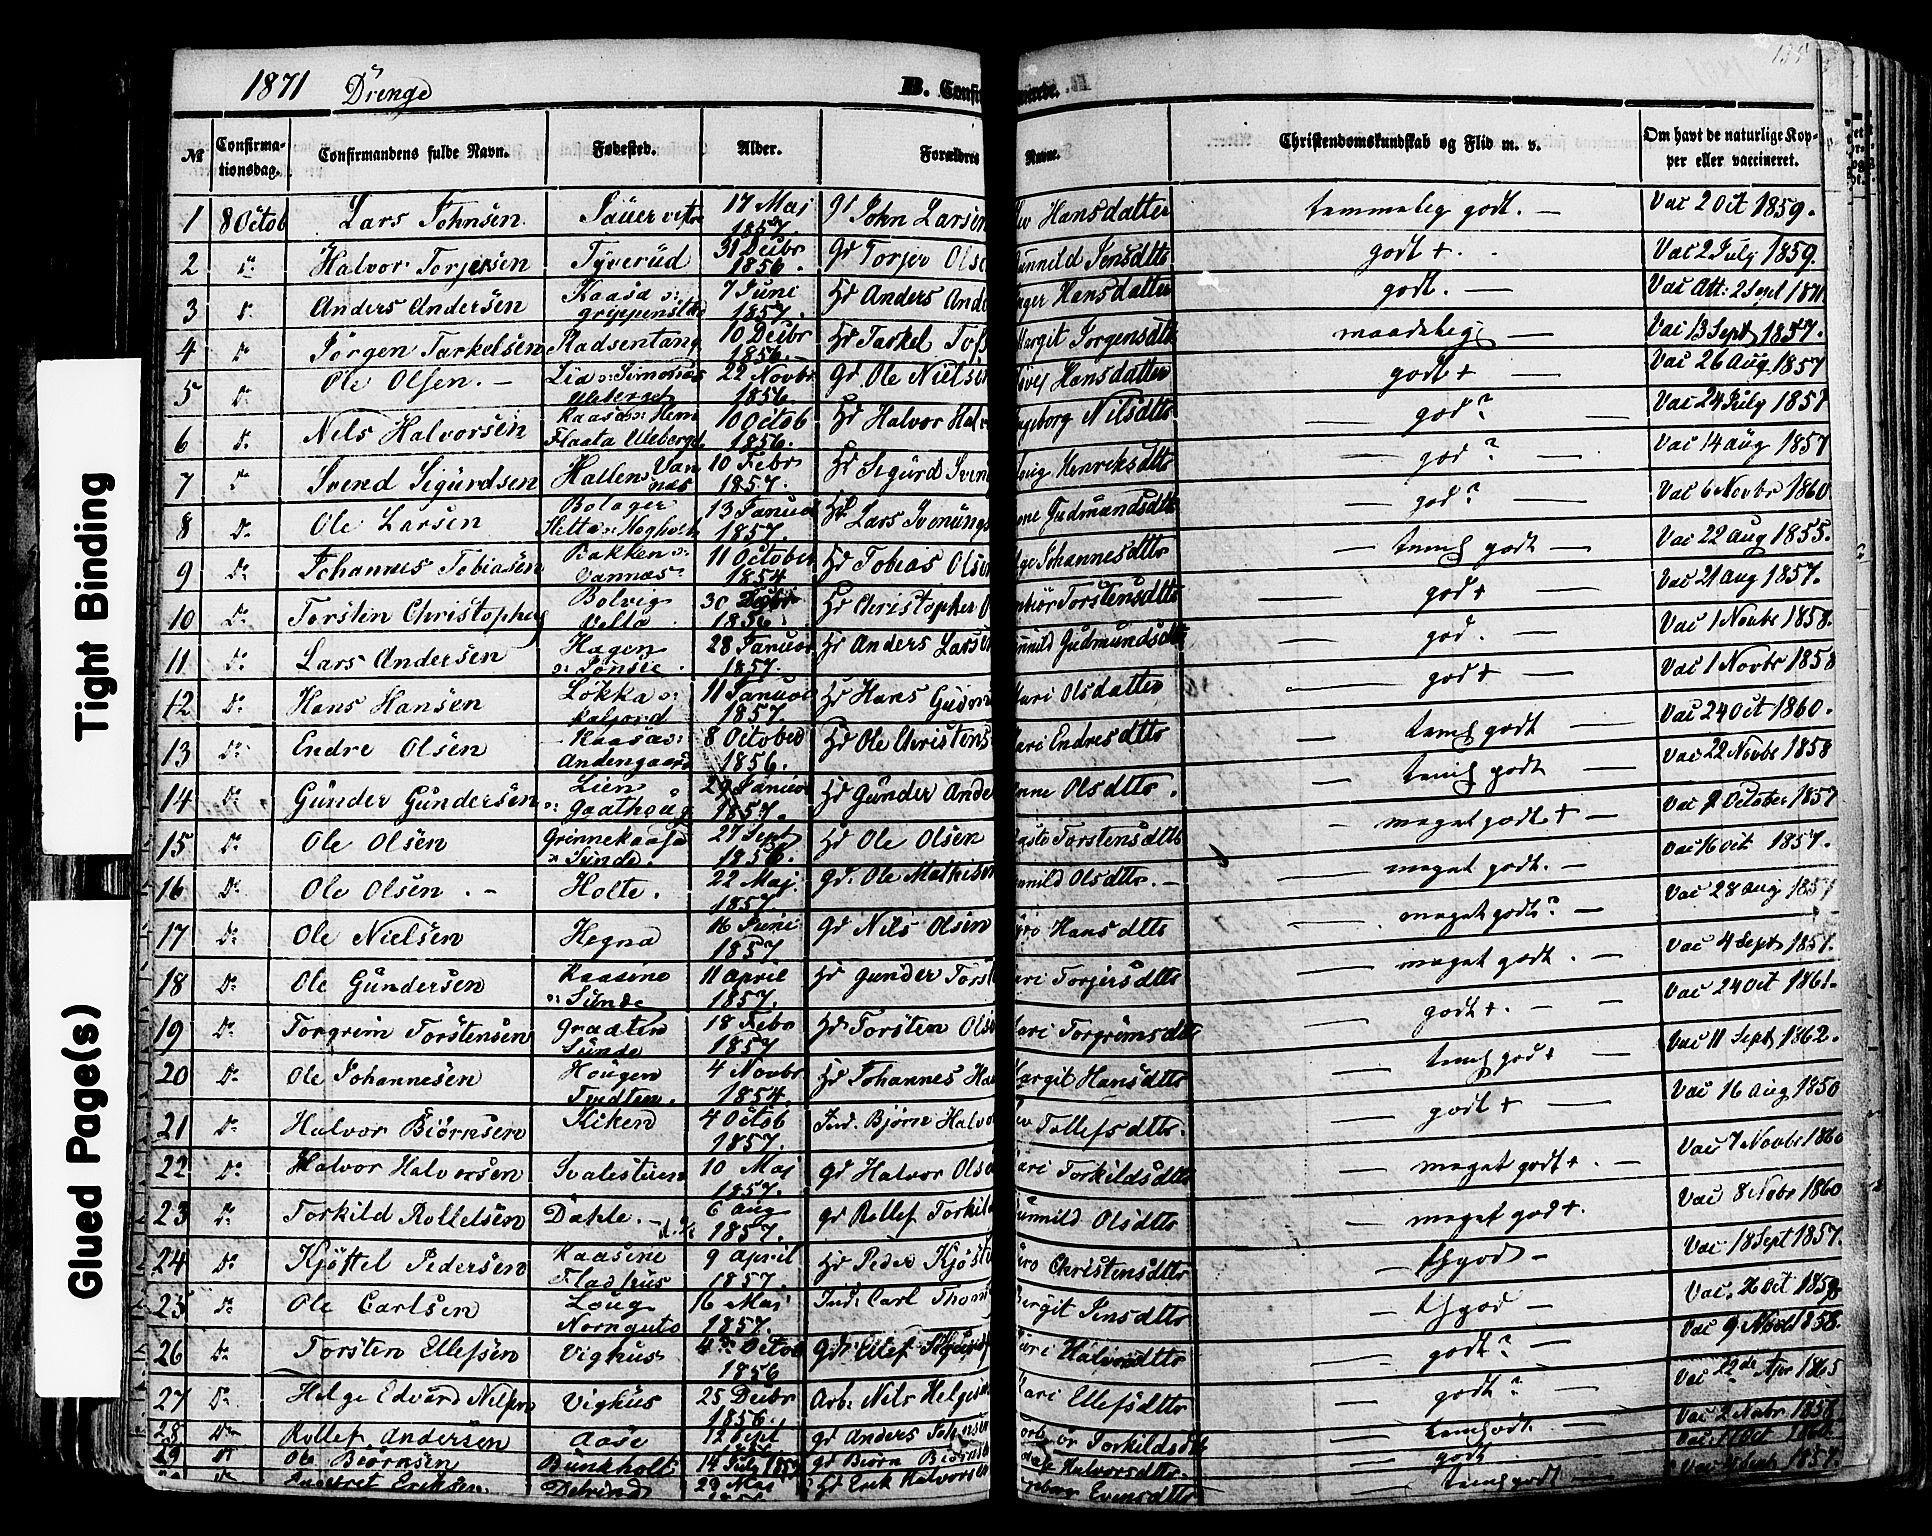 SAKO, Sauherad kirkebøker, F/Fa/L0007: Ministerialbok nr. I 7, 1851-1873, s. 135